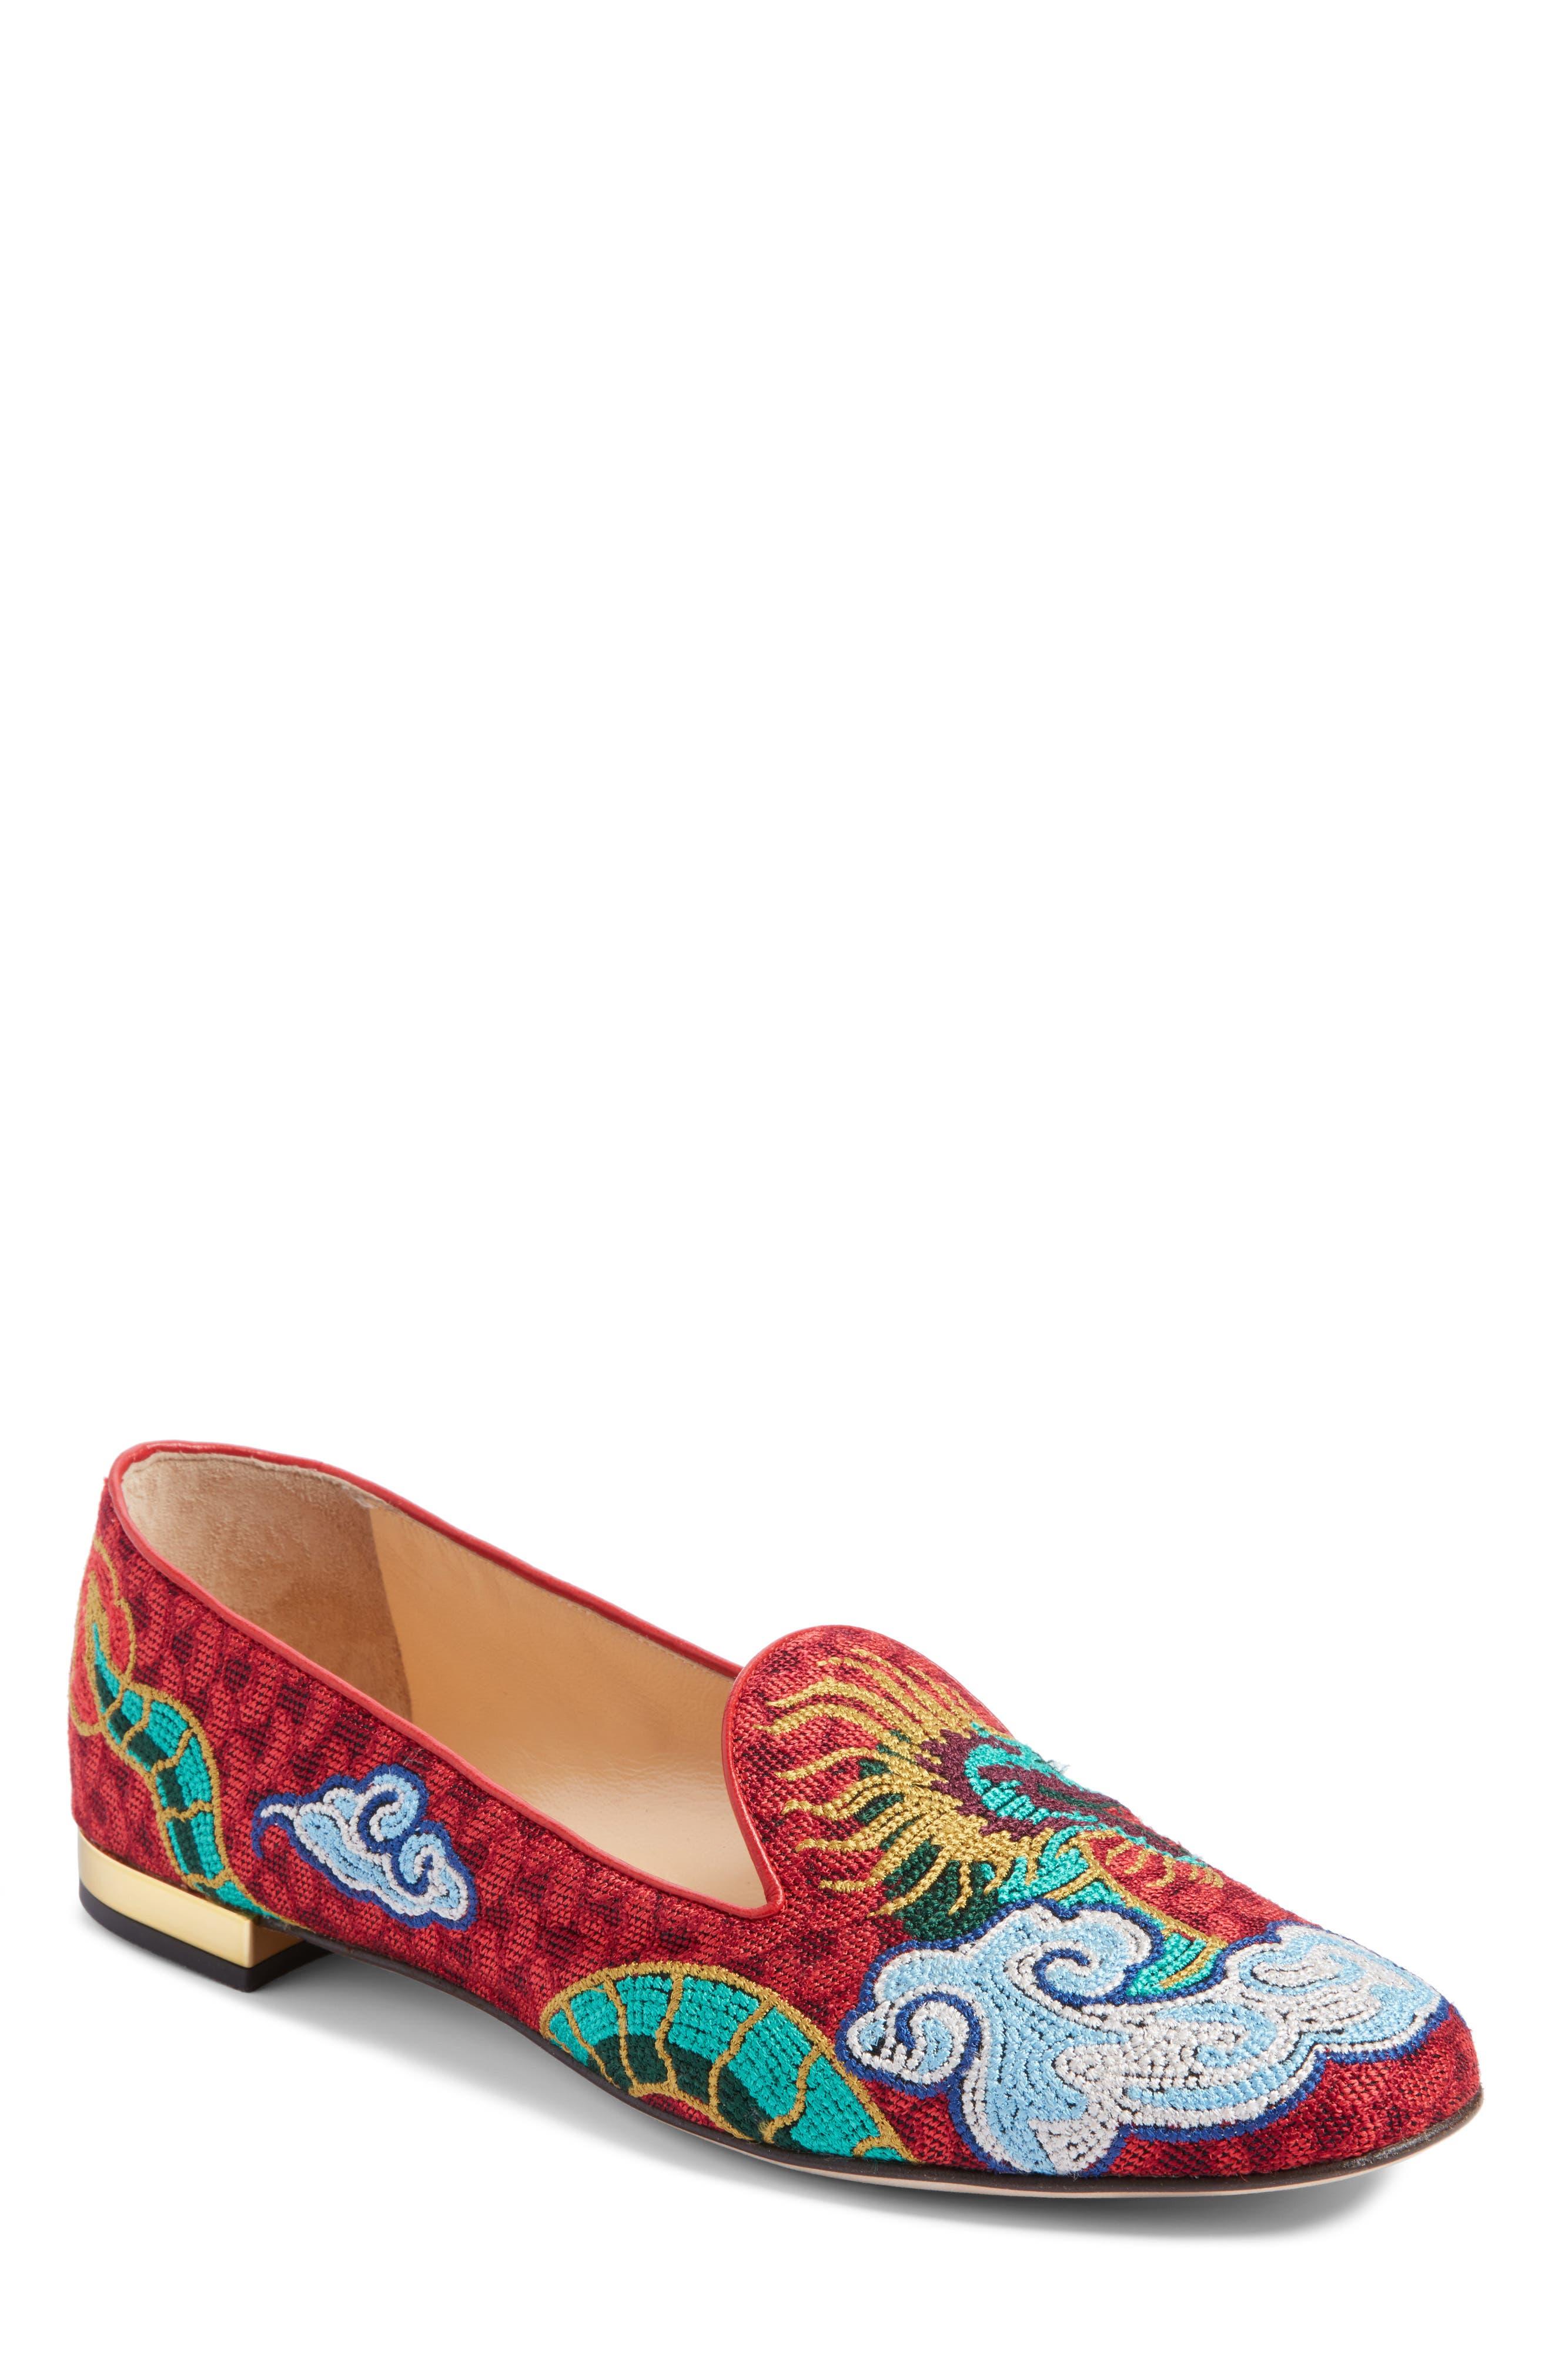 Charlotte Olympia Dragon Slipper Loafer (Women)